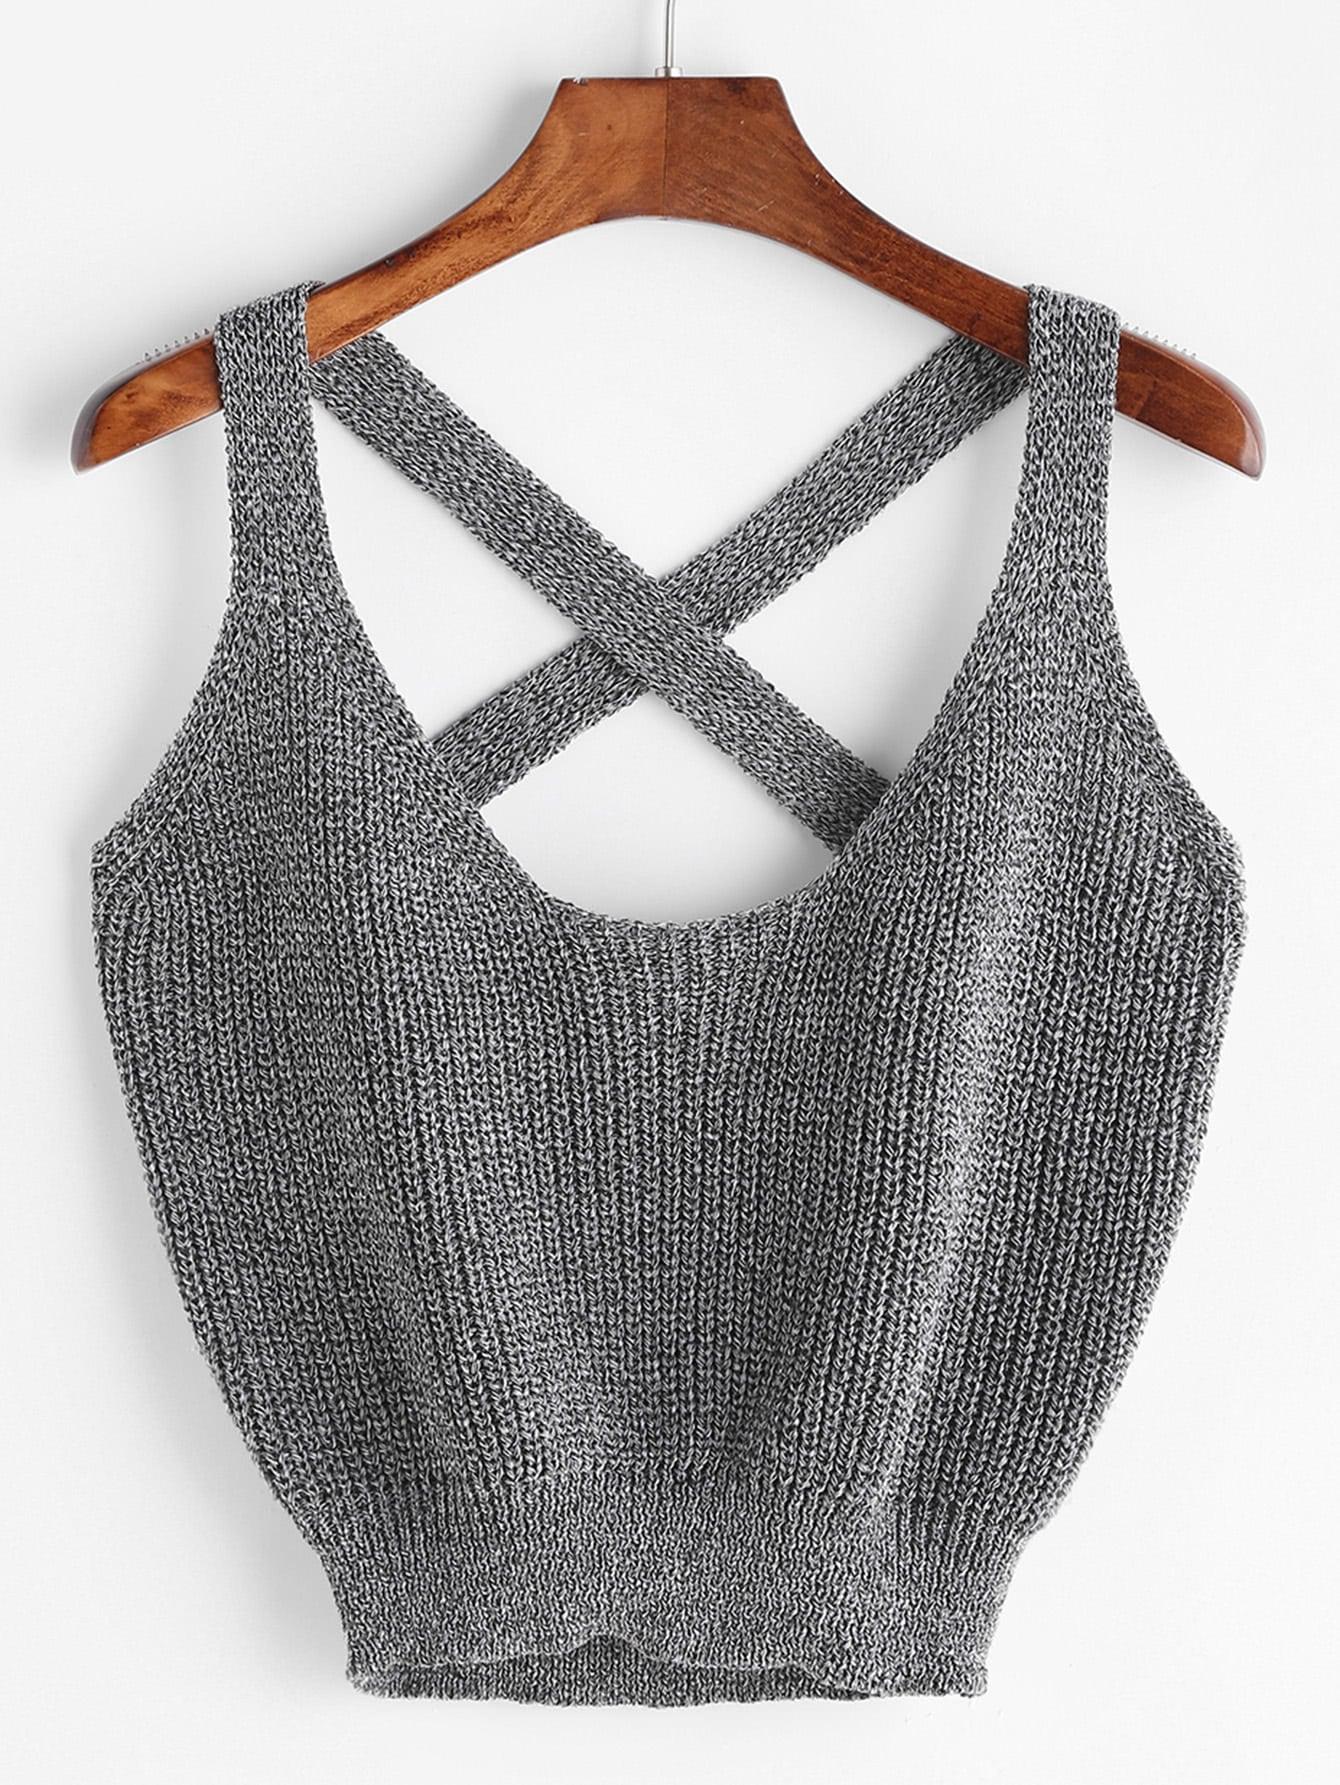 Marled Knit Crisscross Tank Top vest170328457